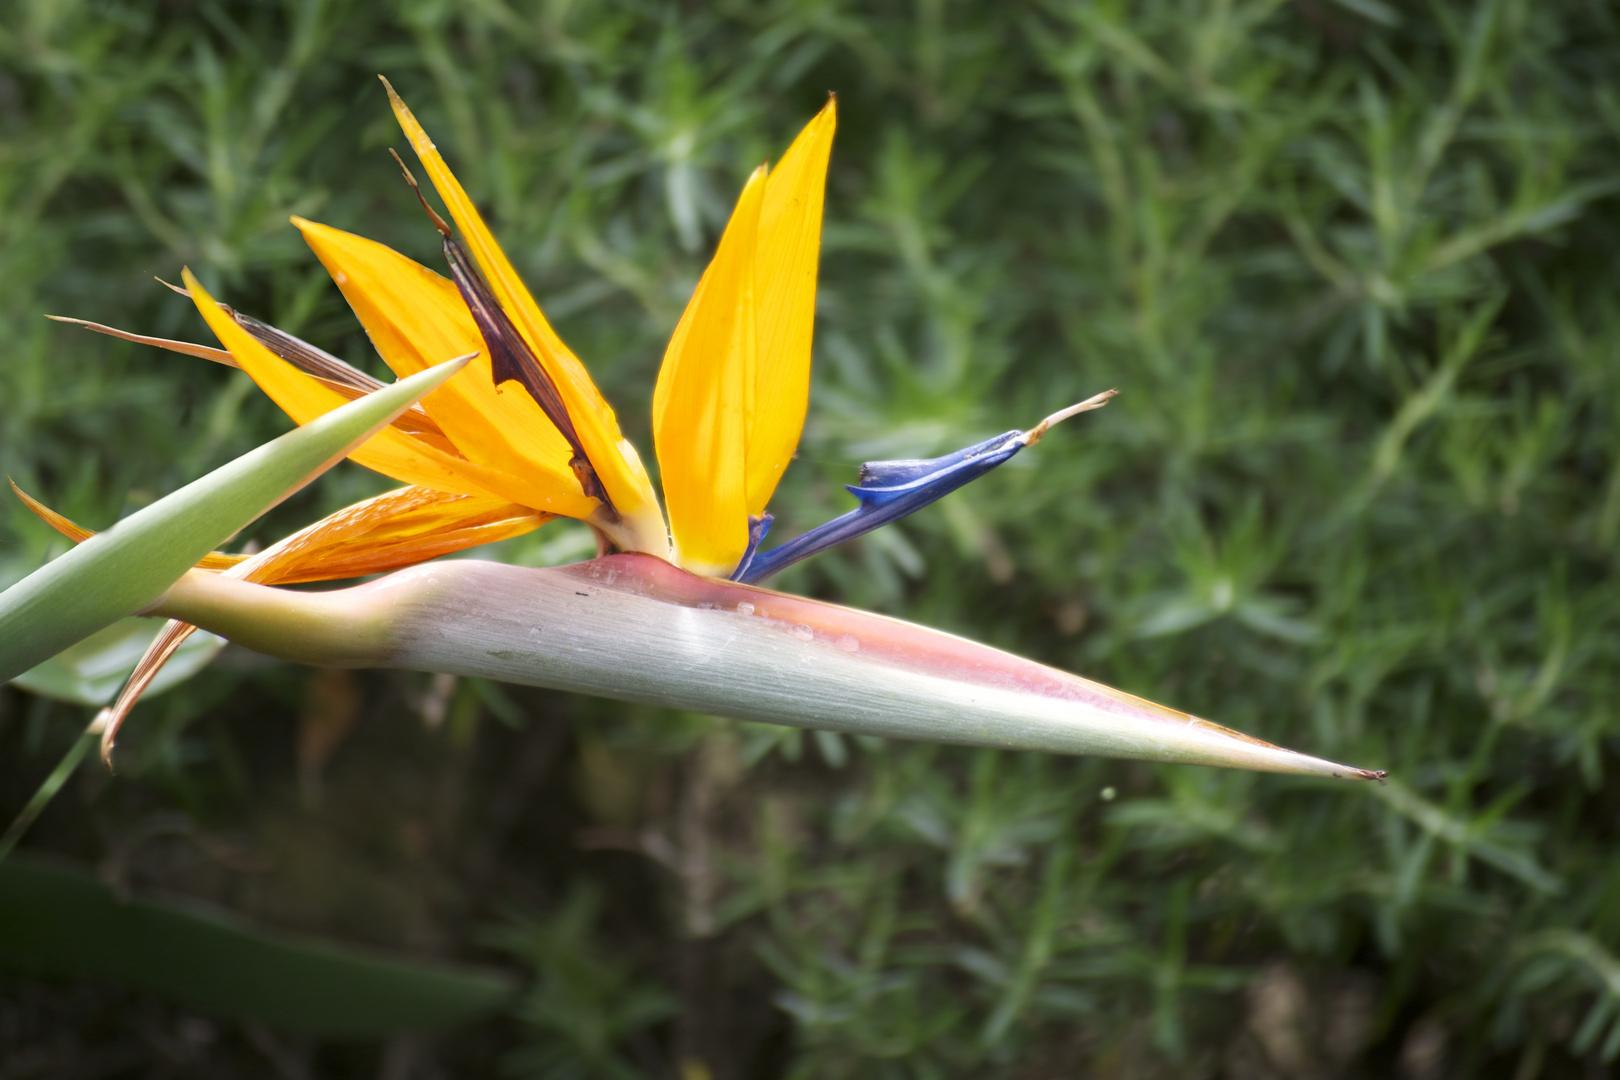 strelitzie reginae - Praradiesvogelblume